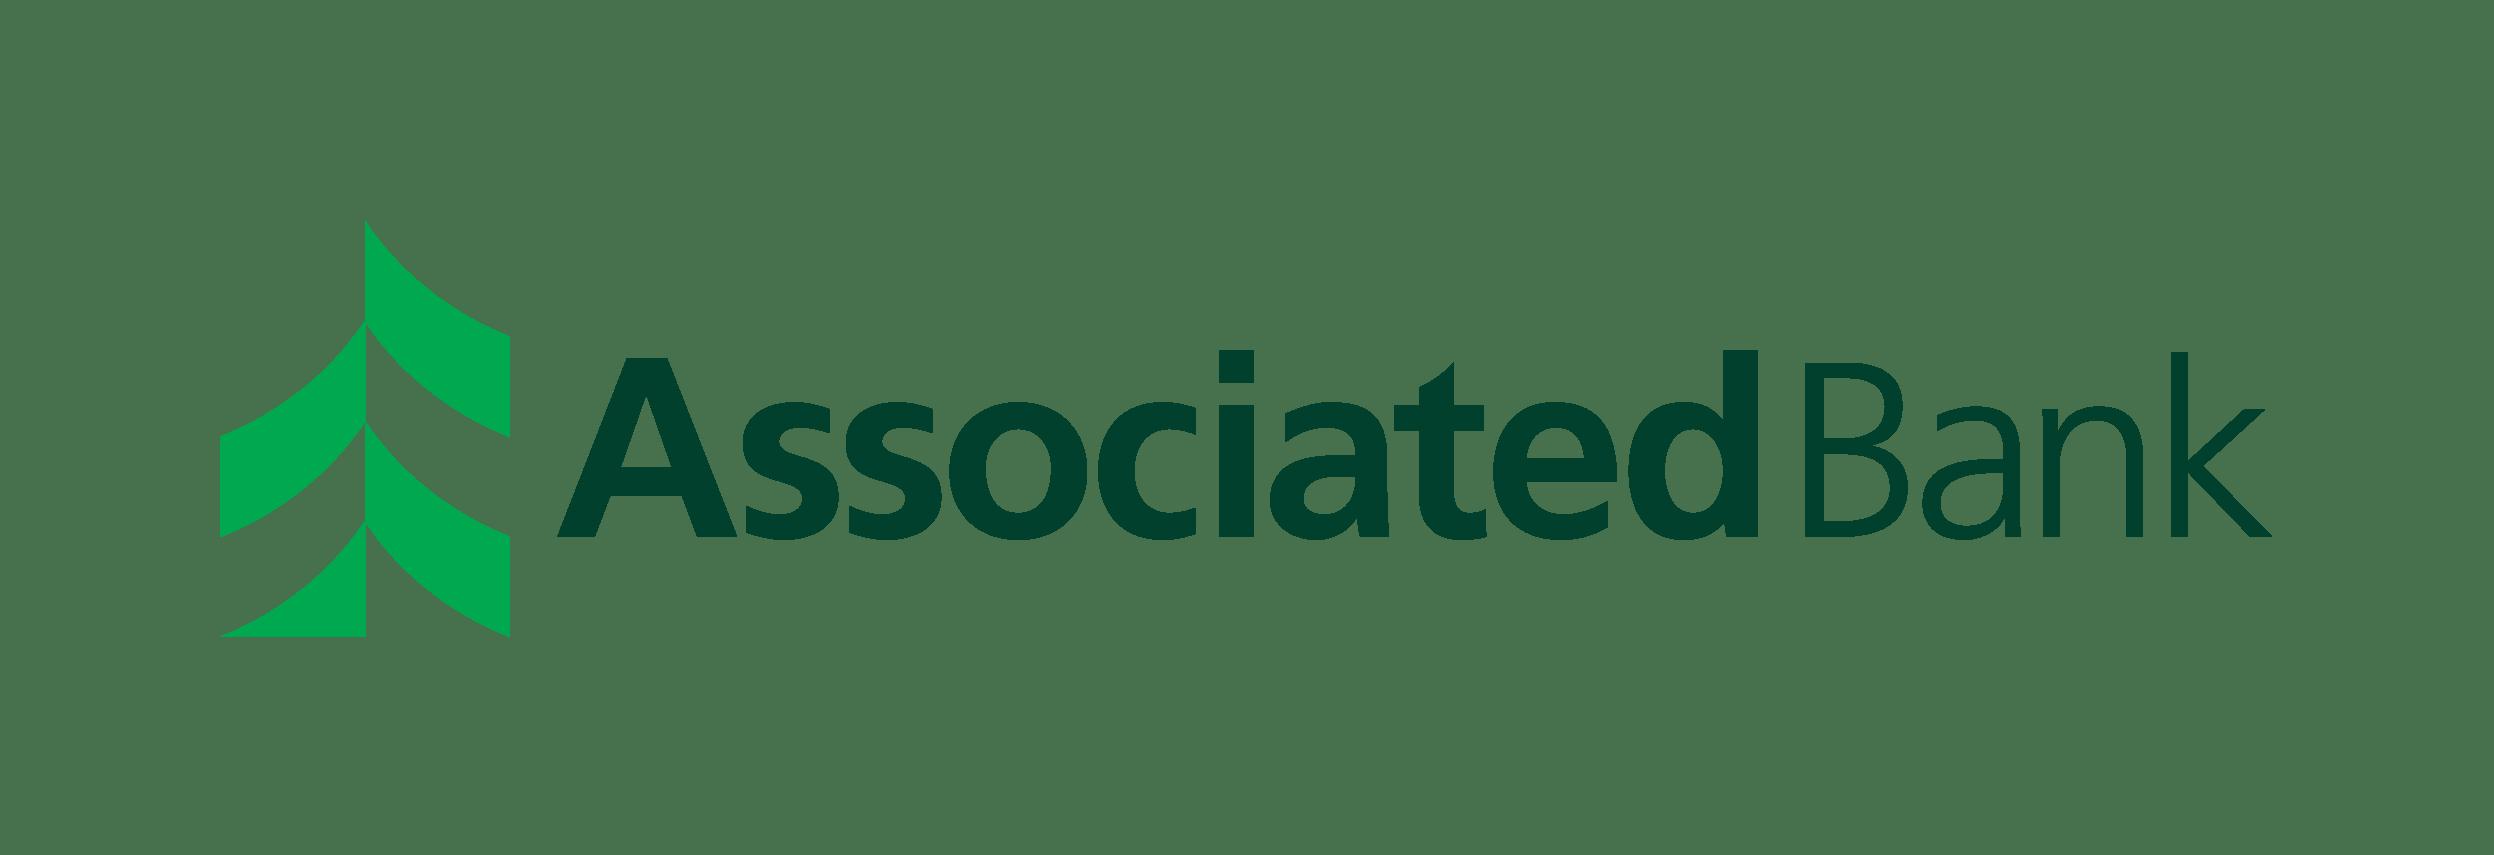 Associated Bank logo png